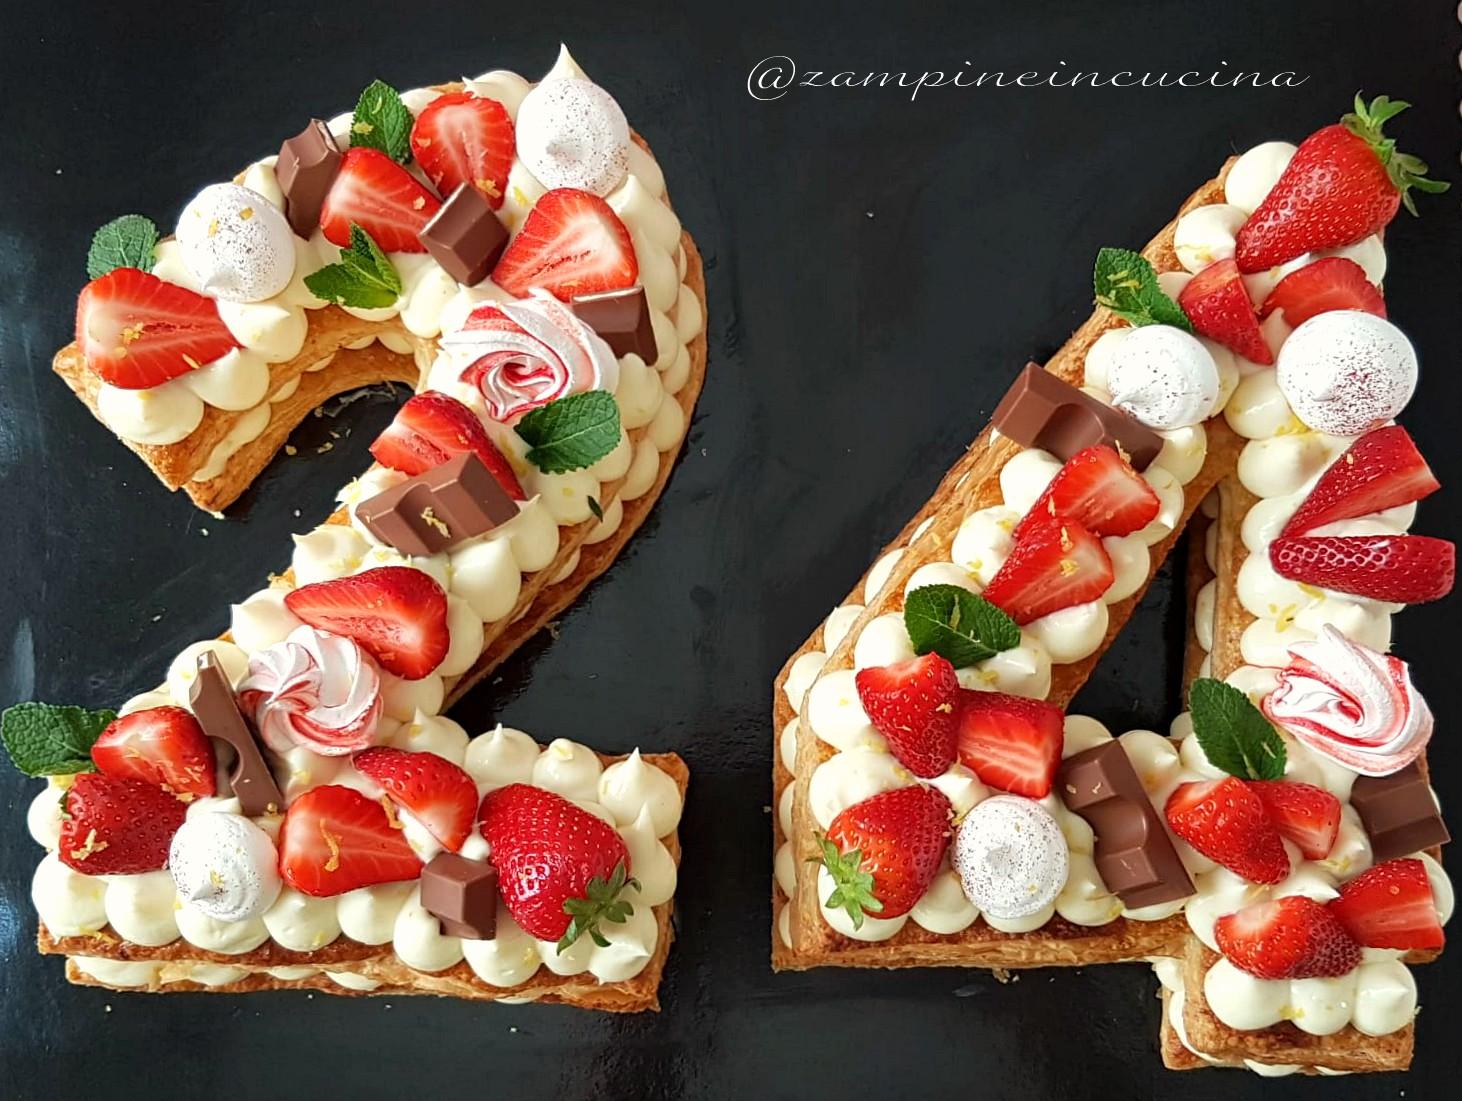 millefoglie Cream tarte con namelanka e fragole